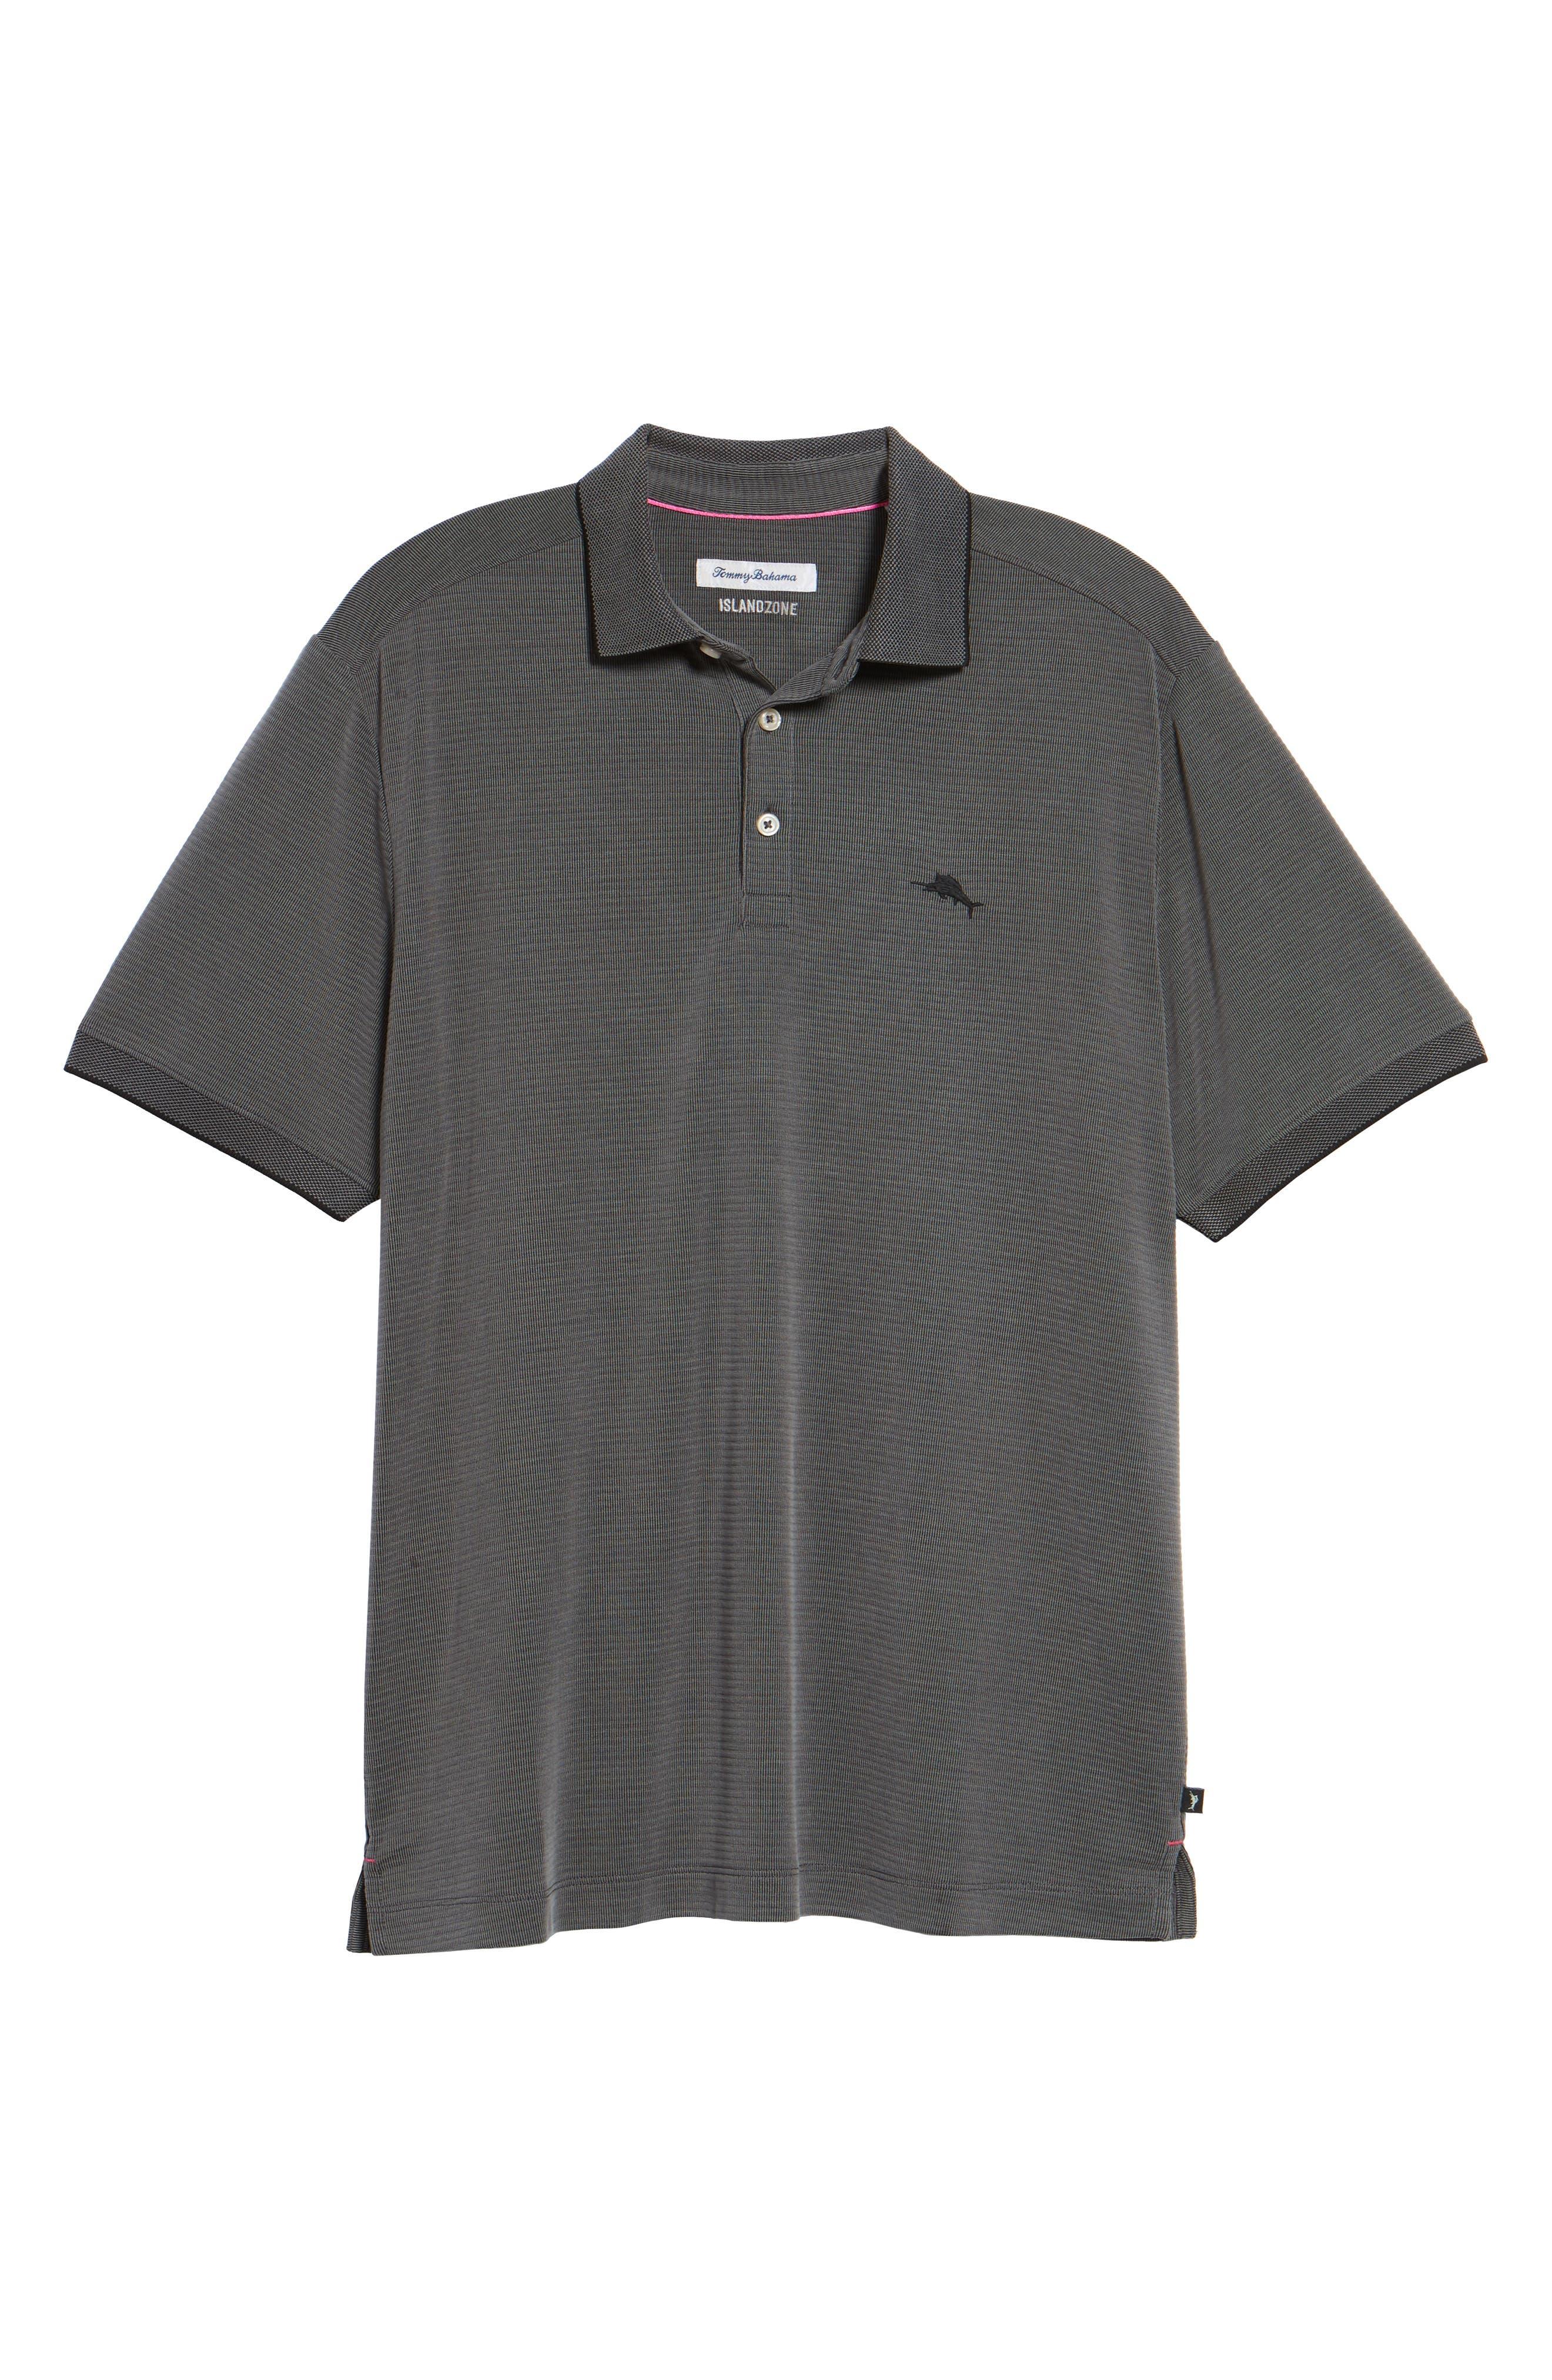 TOMMY BAHAMA, Coastal Crest Polo, Alternate thumbnail 6, color, BLACK